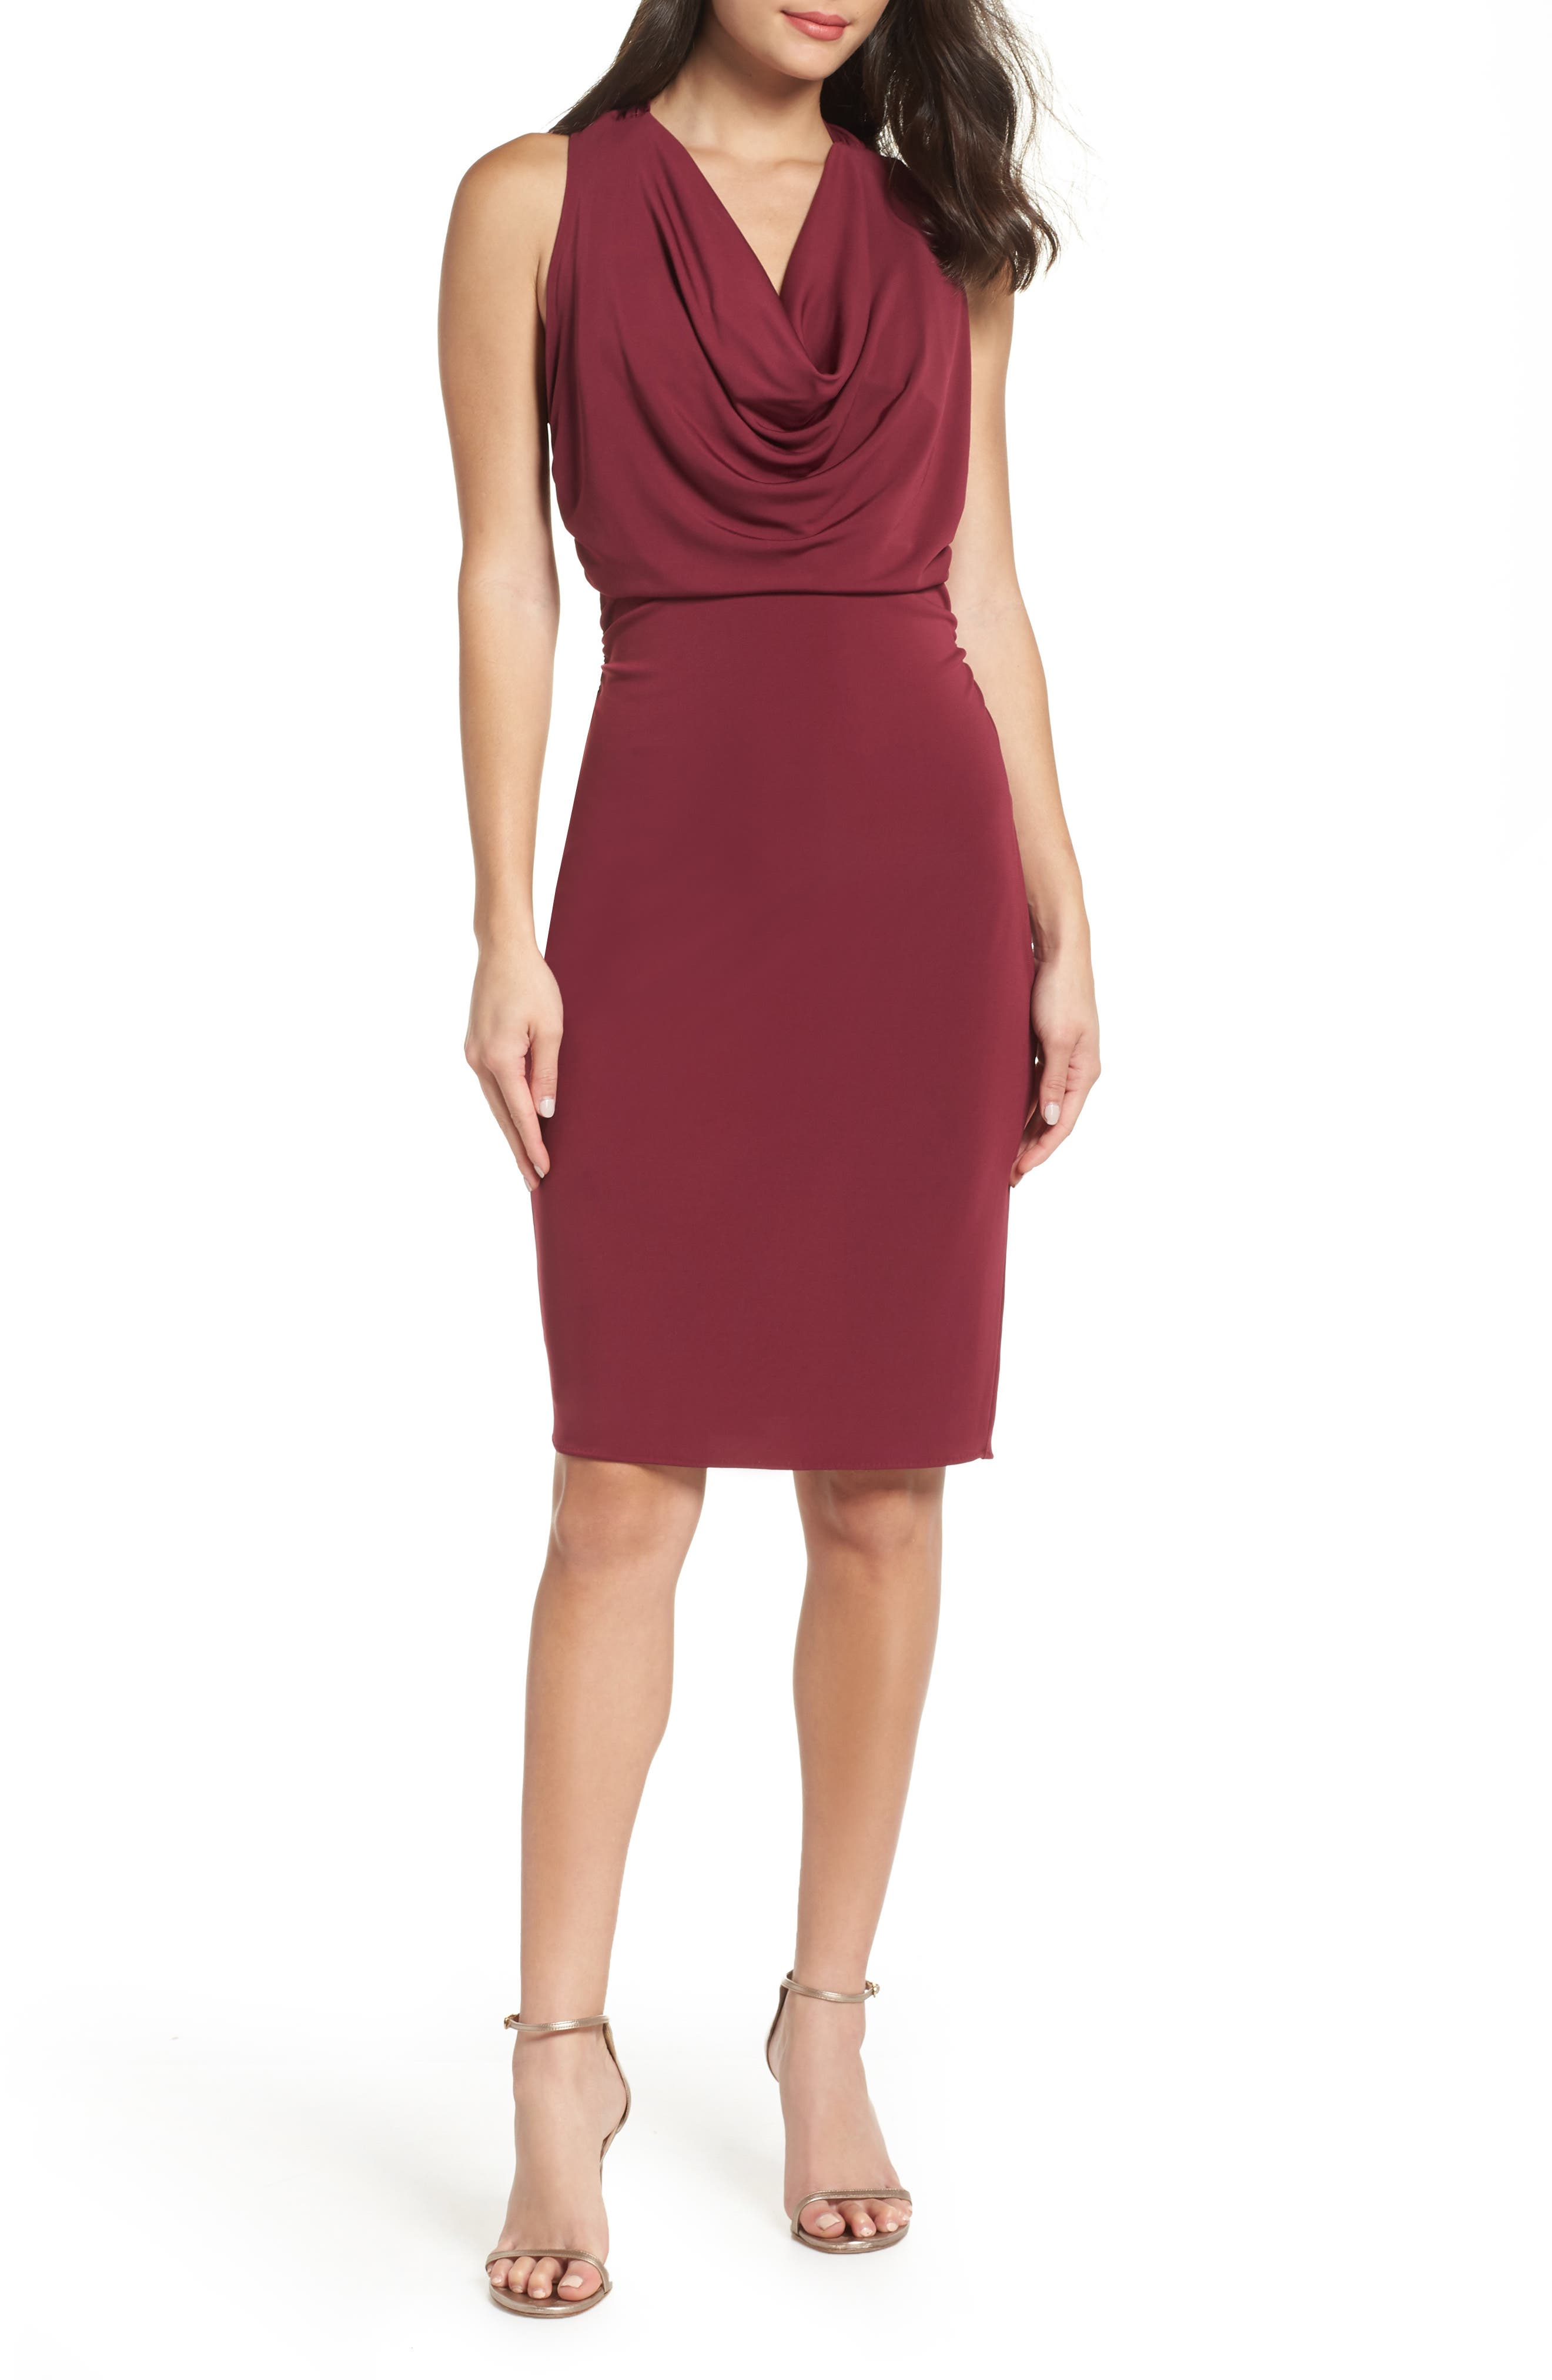 Elise Cowl Neck Sleeveless Dress,                             Main thumbnail 1, color,                             BURGUNDY